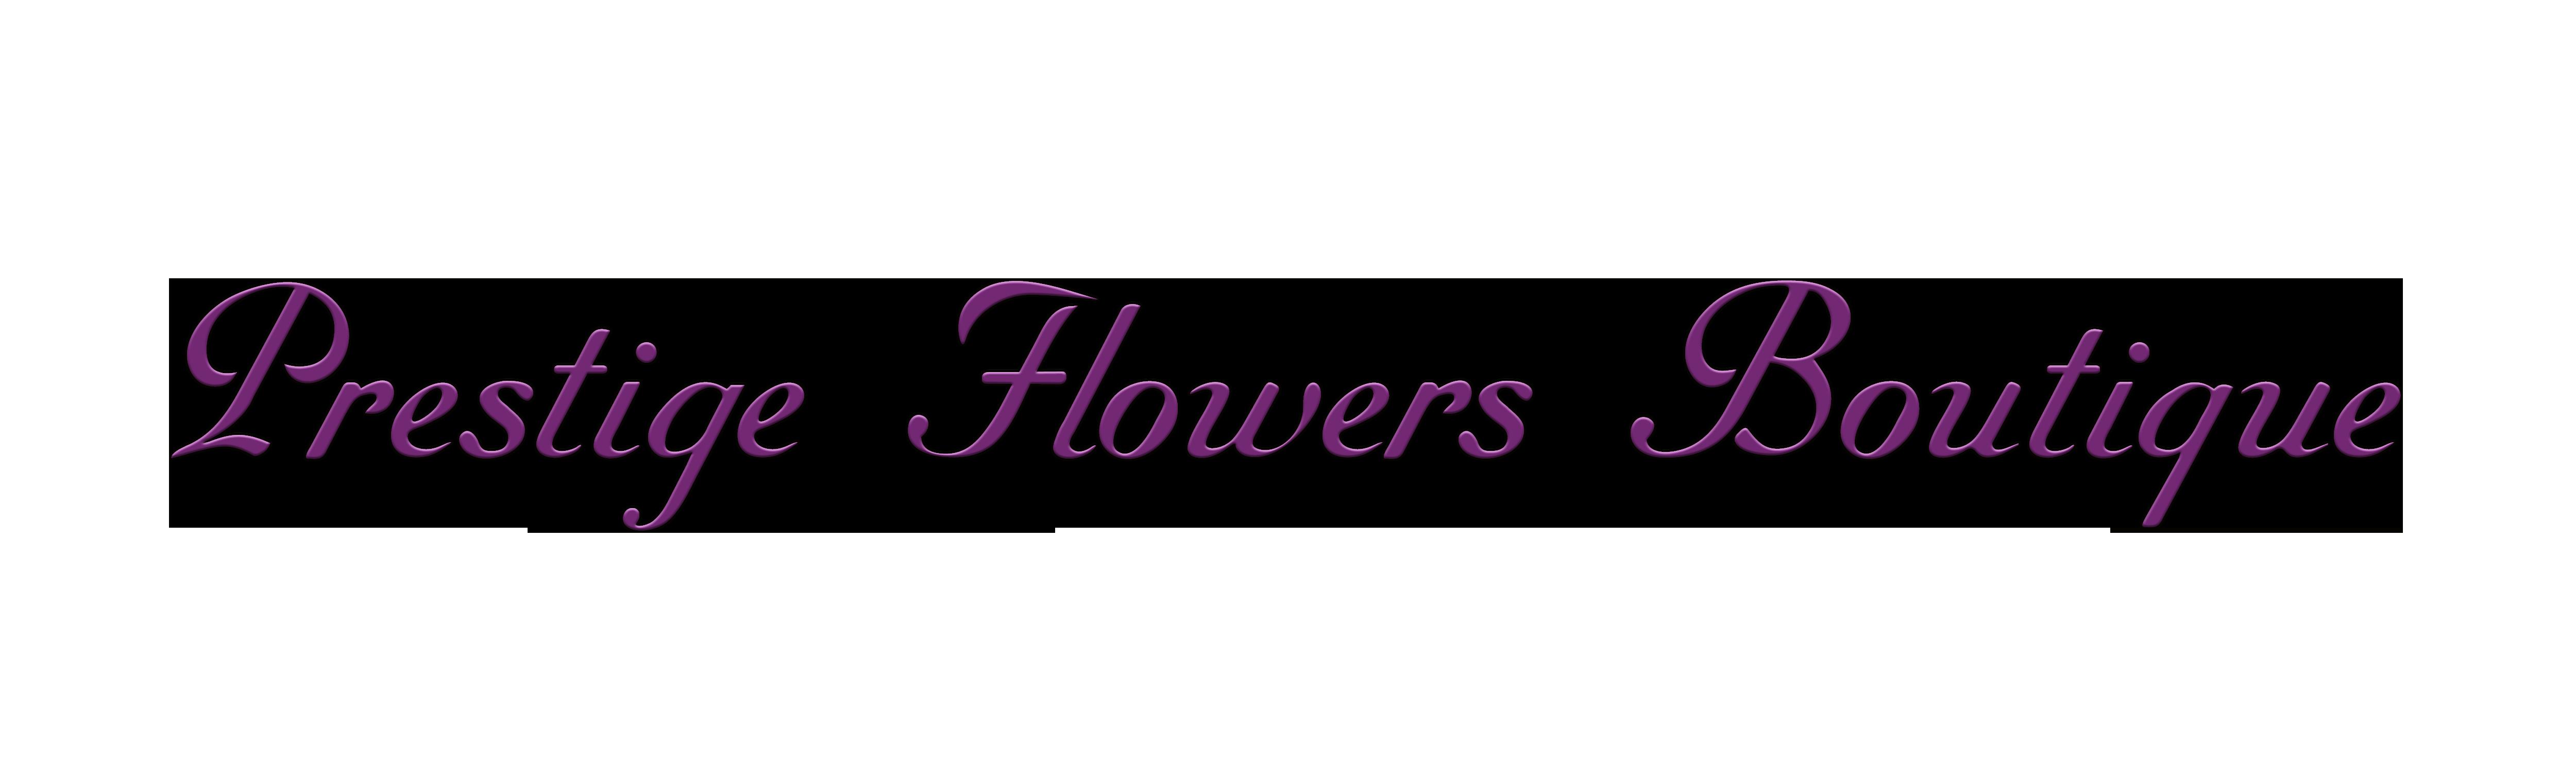 Prestige Flowers Boutique - Ghidul de Chiajna